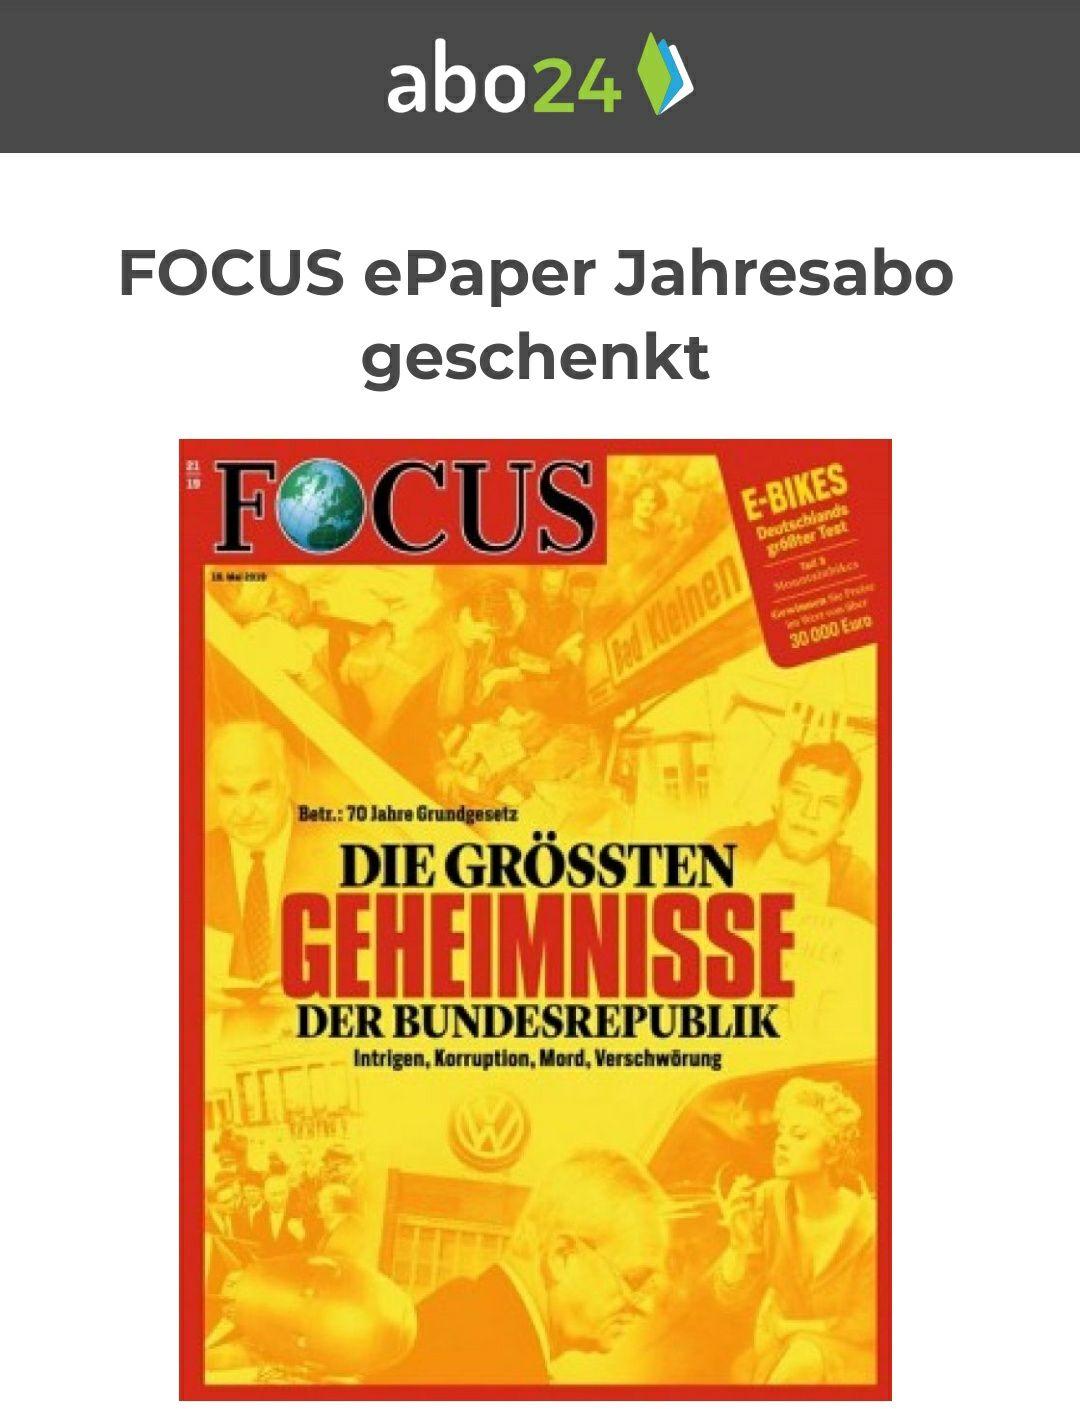 [Abo24] Focus e-paper 12 Monate umsonst & selbstendend